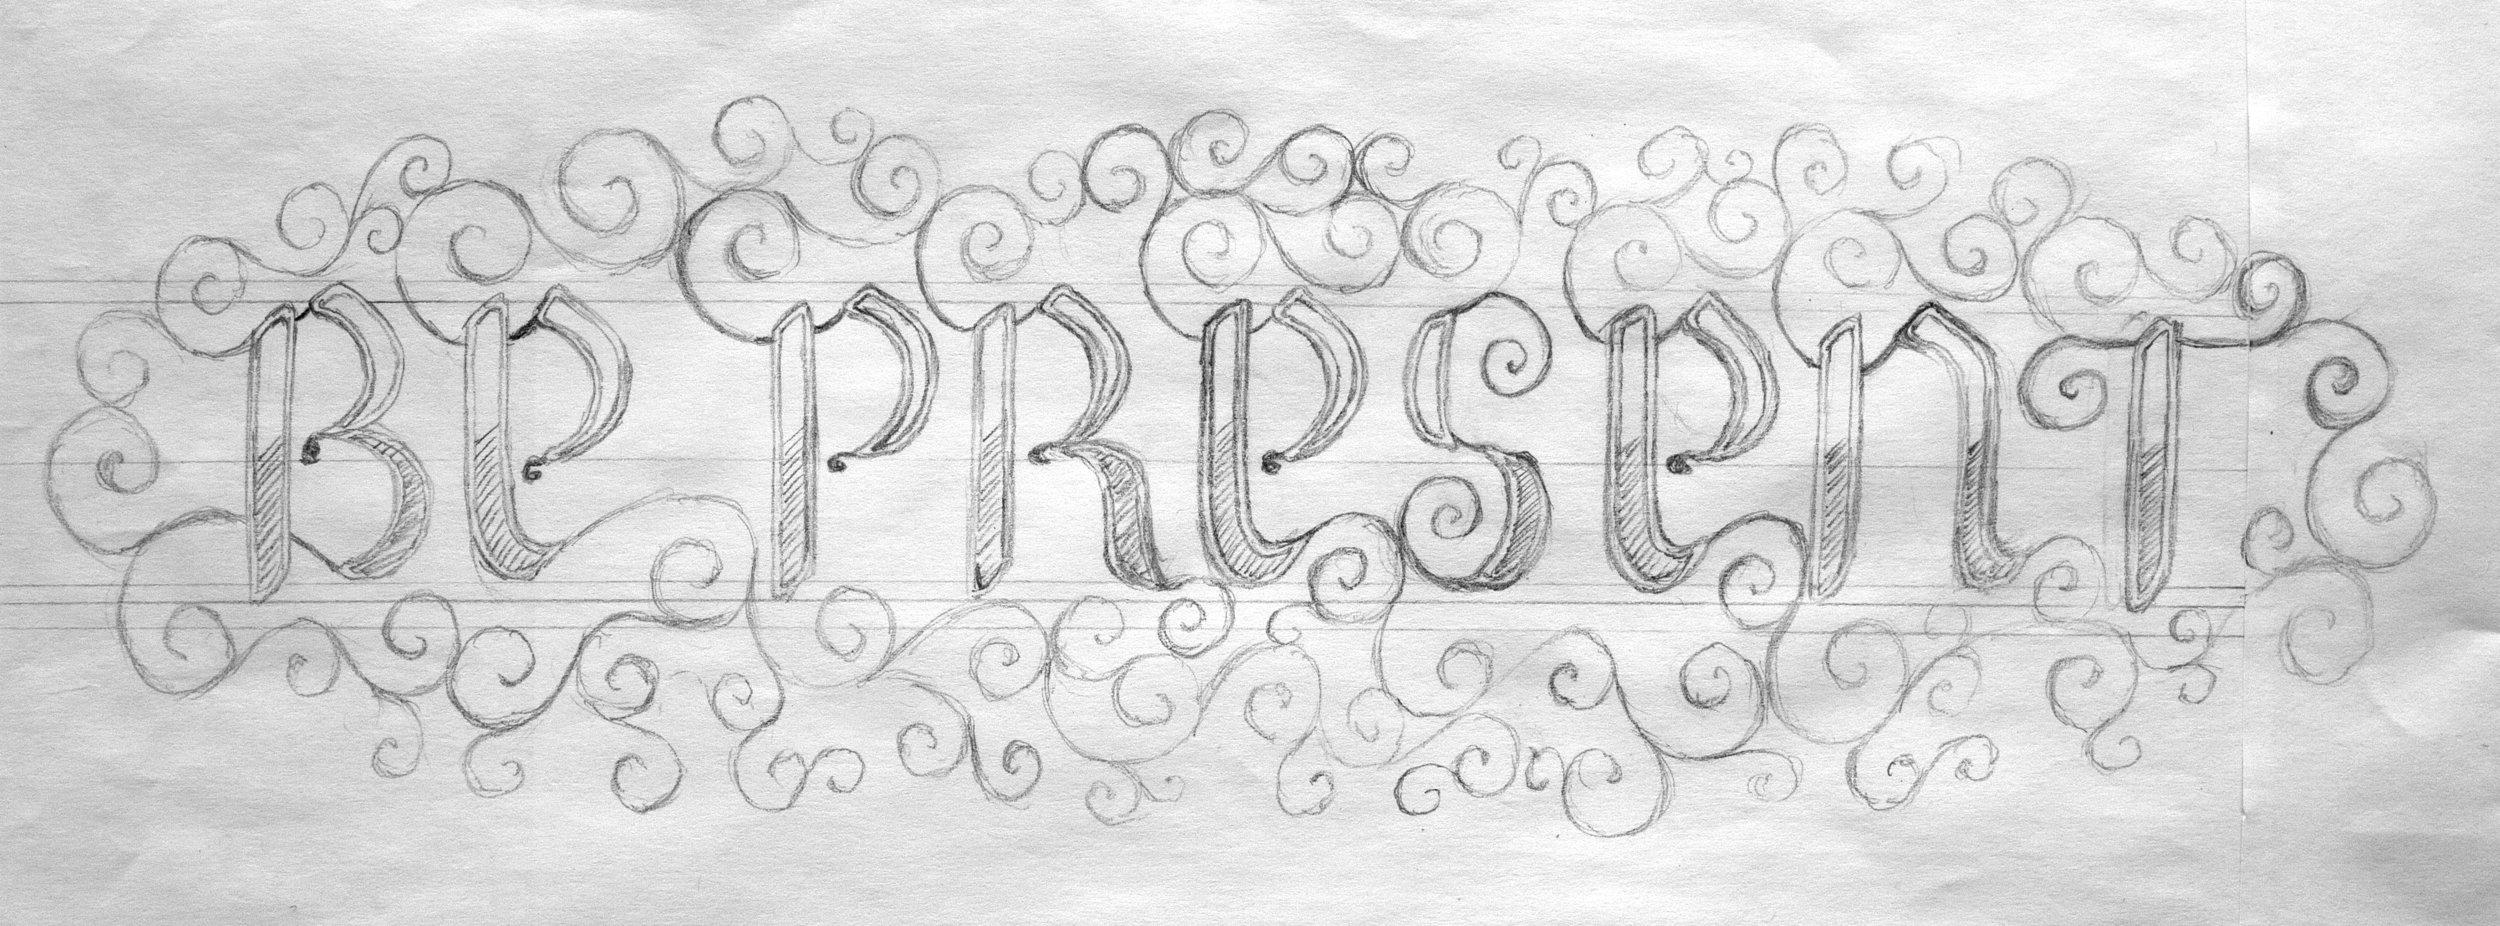 be-present_sketch.jpg